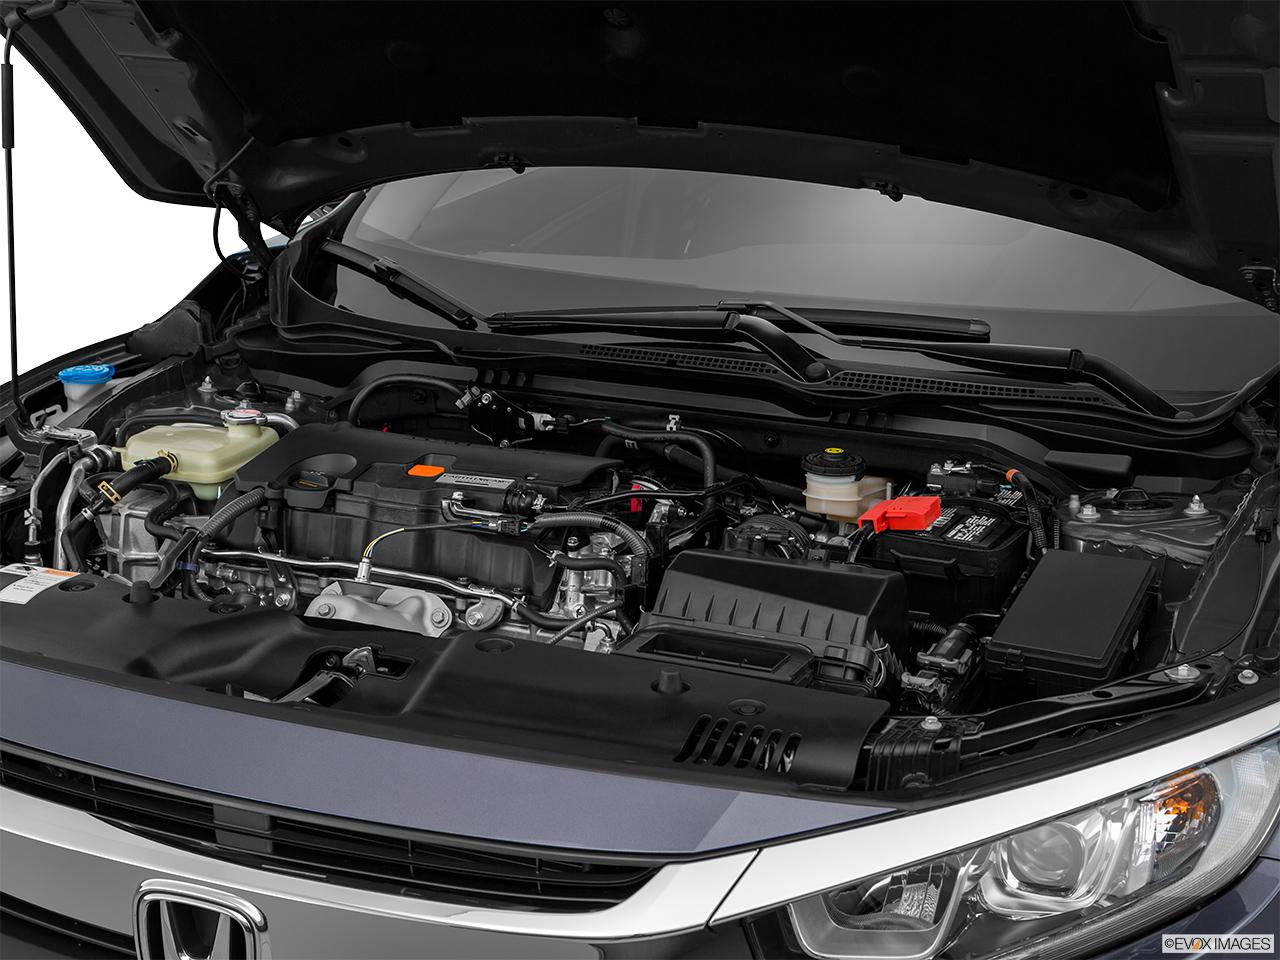 Honda Civic 2018 1.6L DX in Qatar: New Car Prices, Specs ...